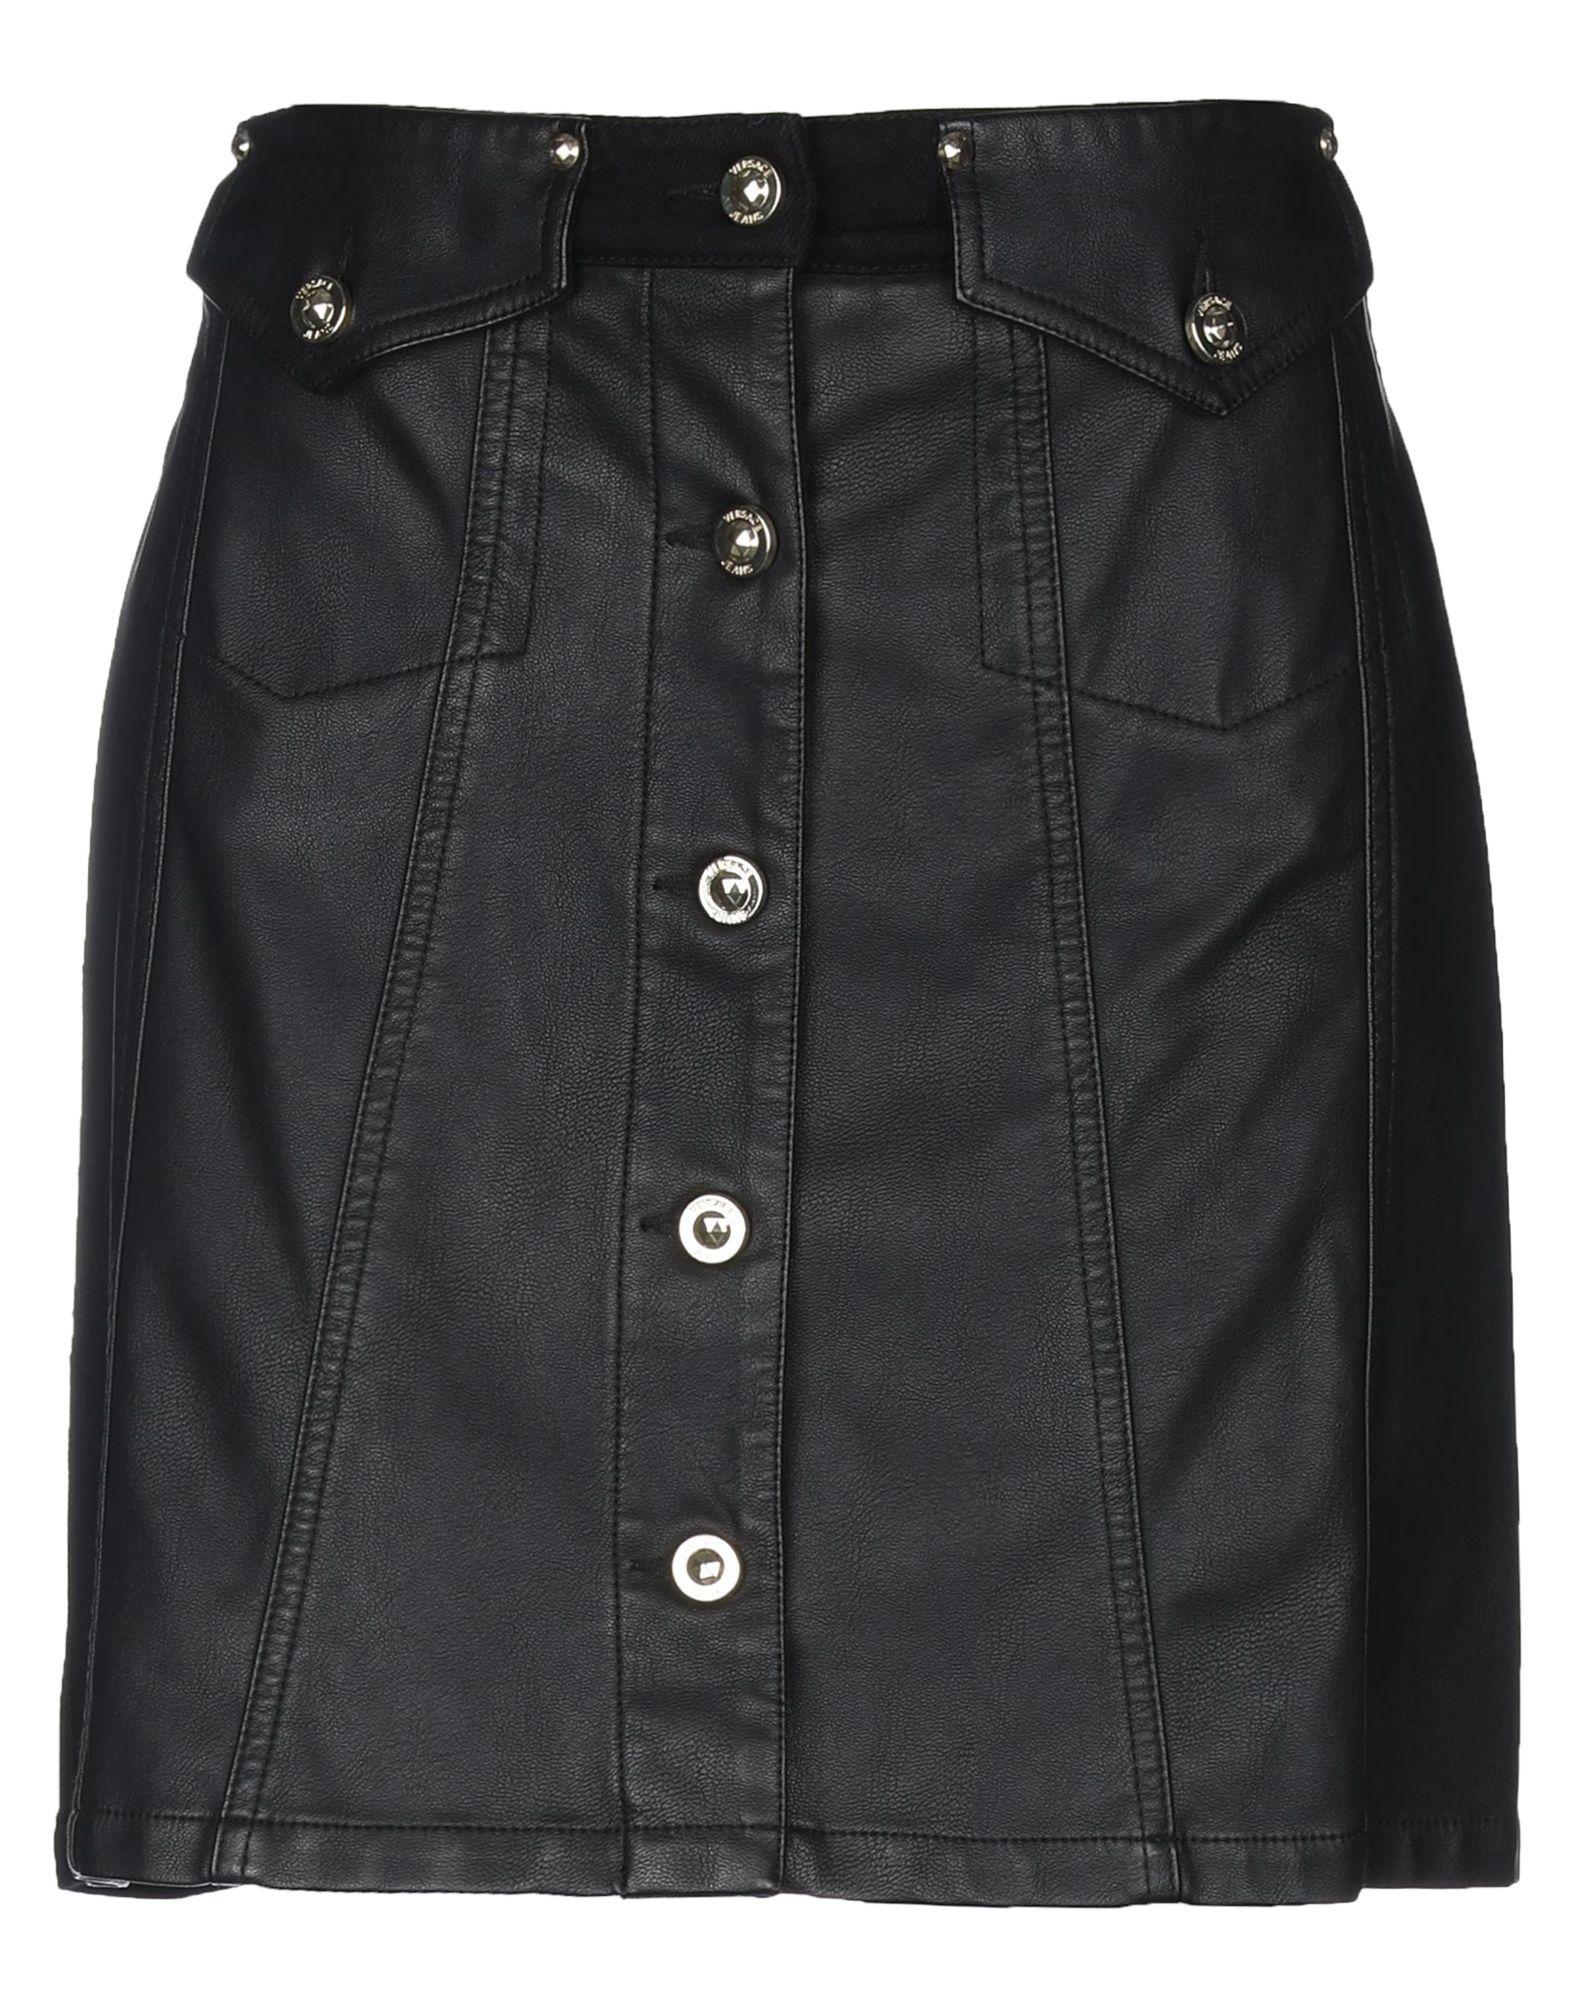 Minigonna Versace Jeans damen - 35416276QT